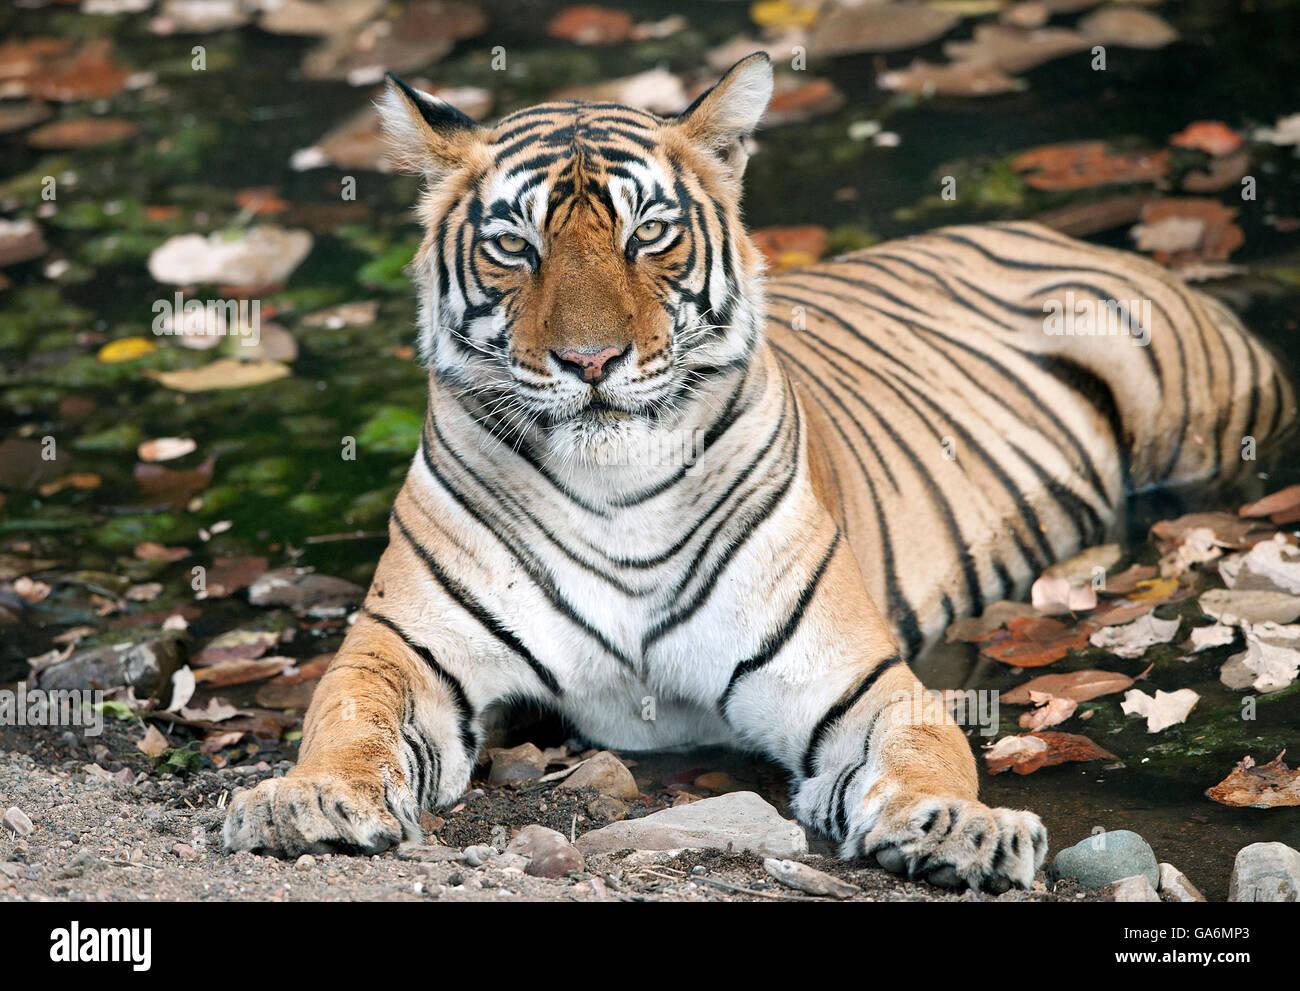 The image of Tiger ( Panthera tigris ) T39, Noor was taken in Ranthambore, India - Stock Image